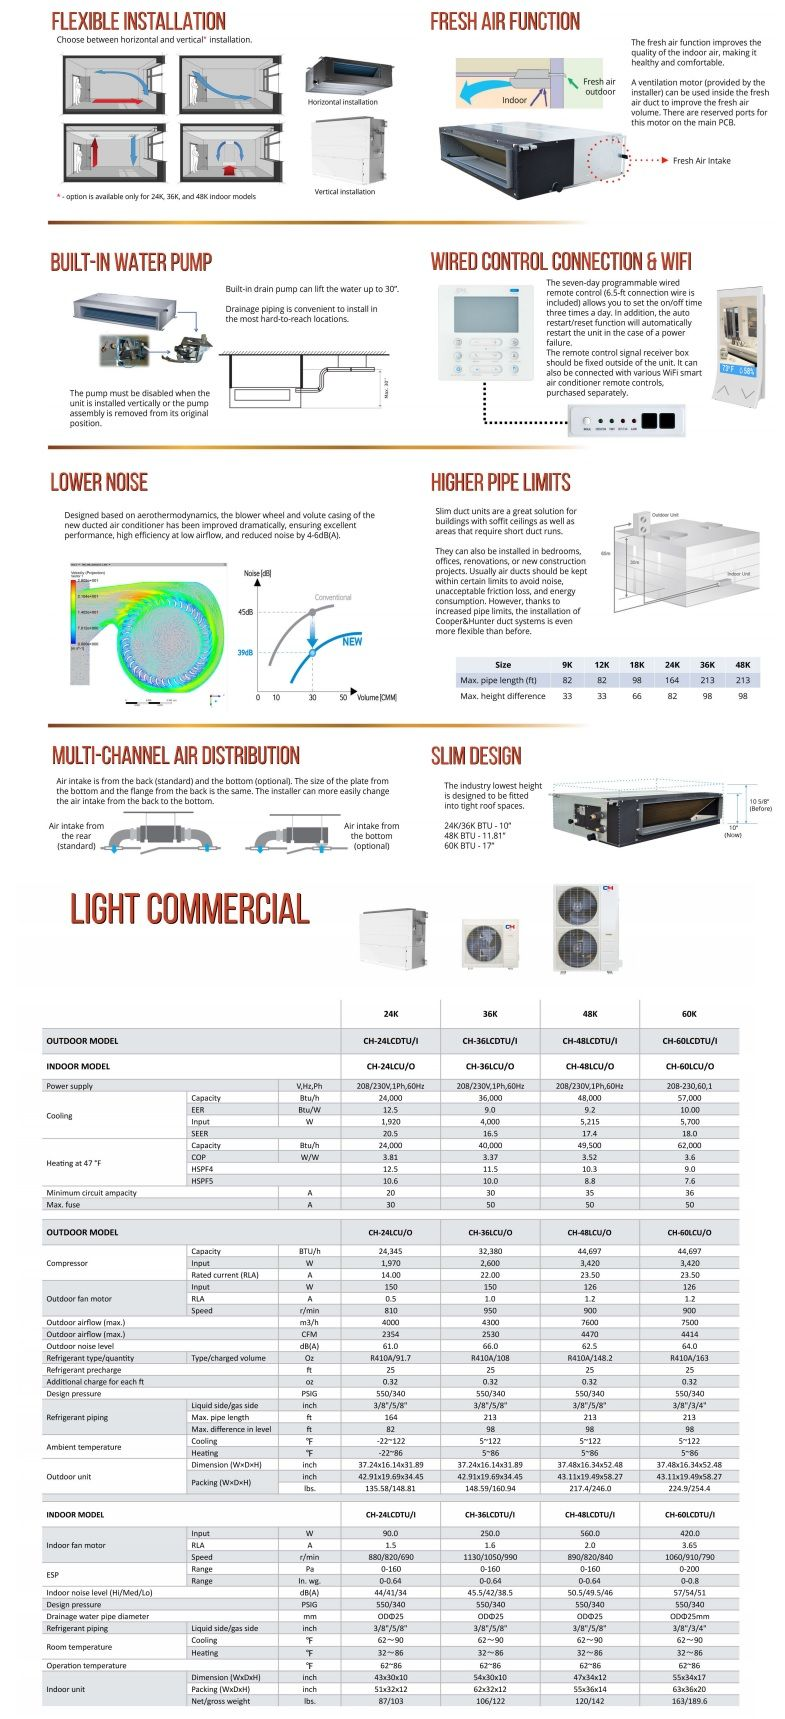 chigo ductless air conditioner compressor wiring diagram all new mini split ductless heatpump systems may 2019  mini split ductless heatpump systems